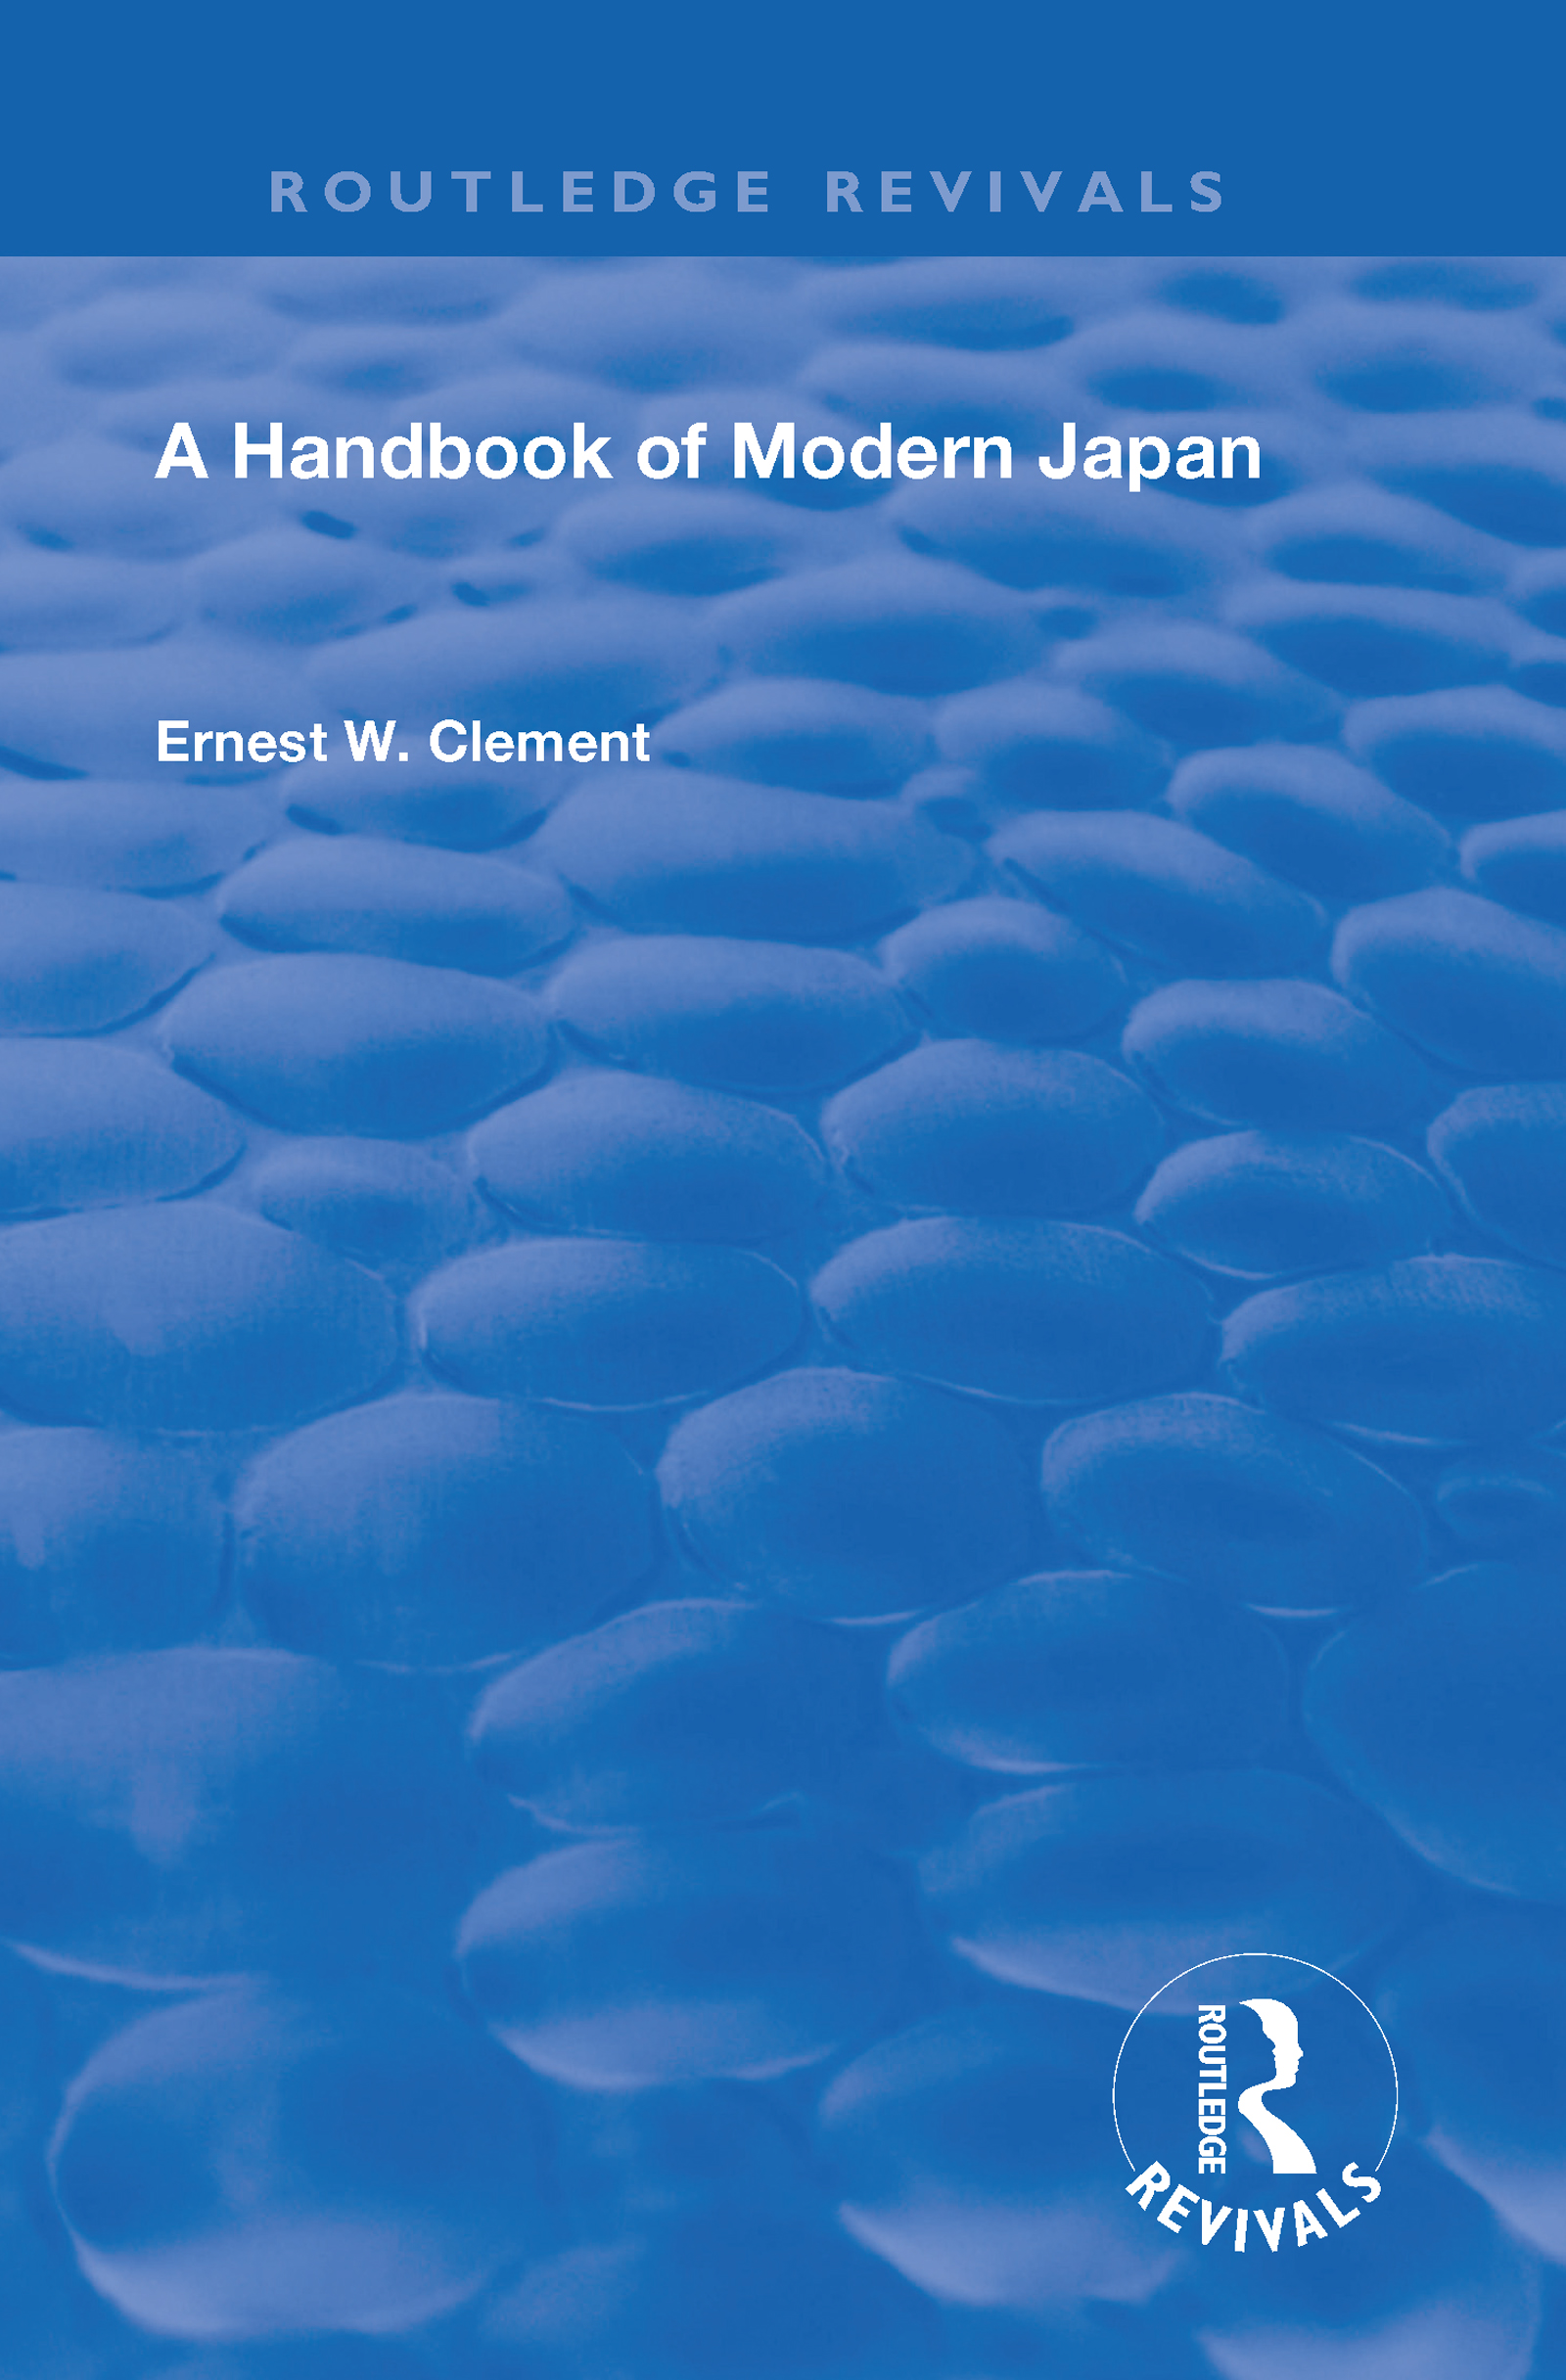 Revival: A Handbook of Modern Japan (1903)